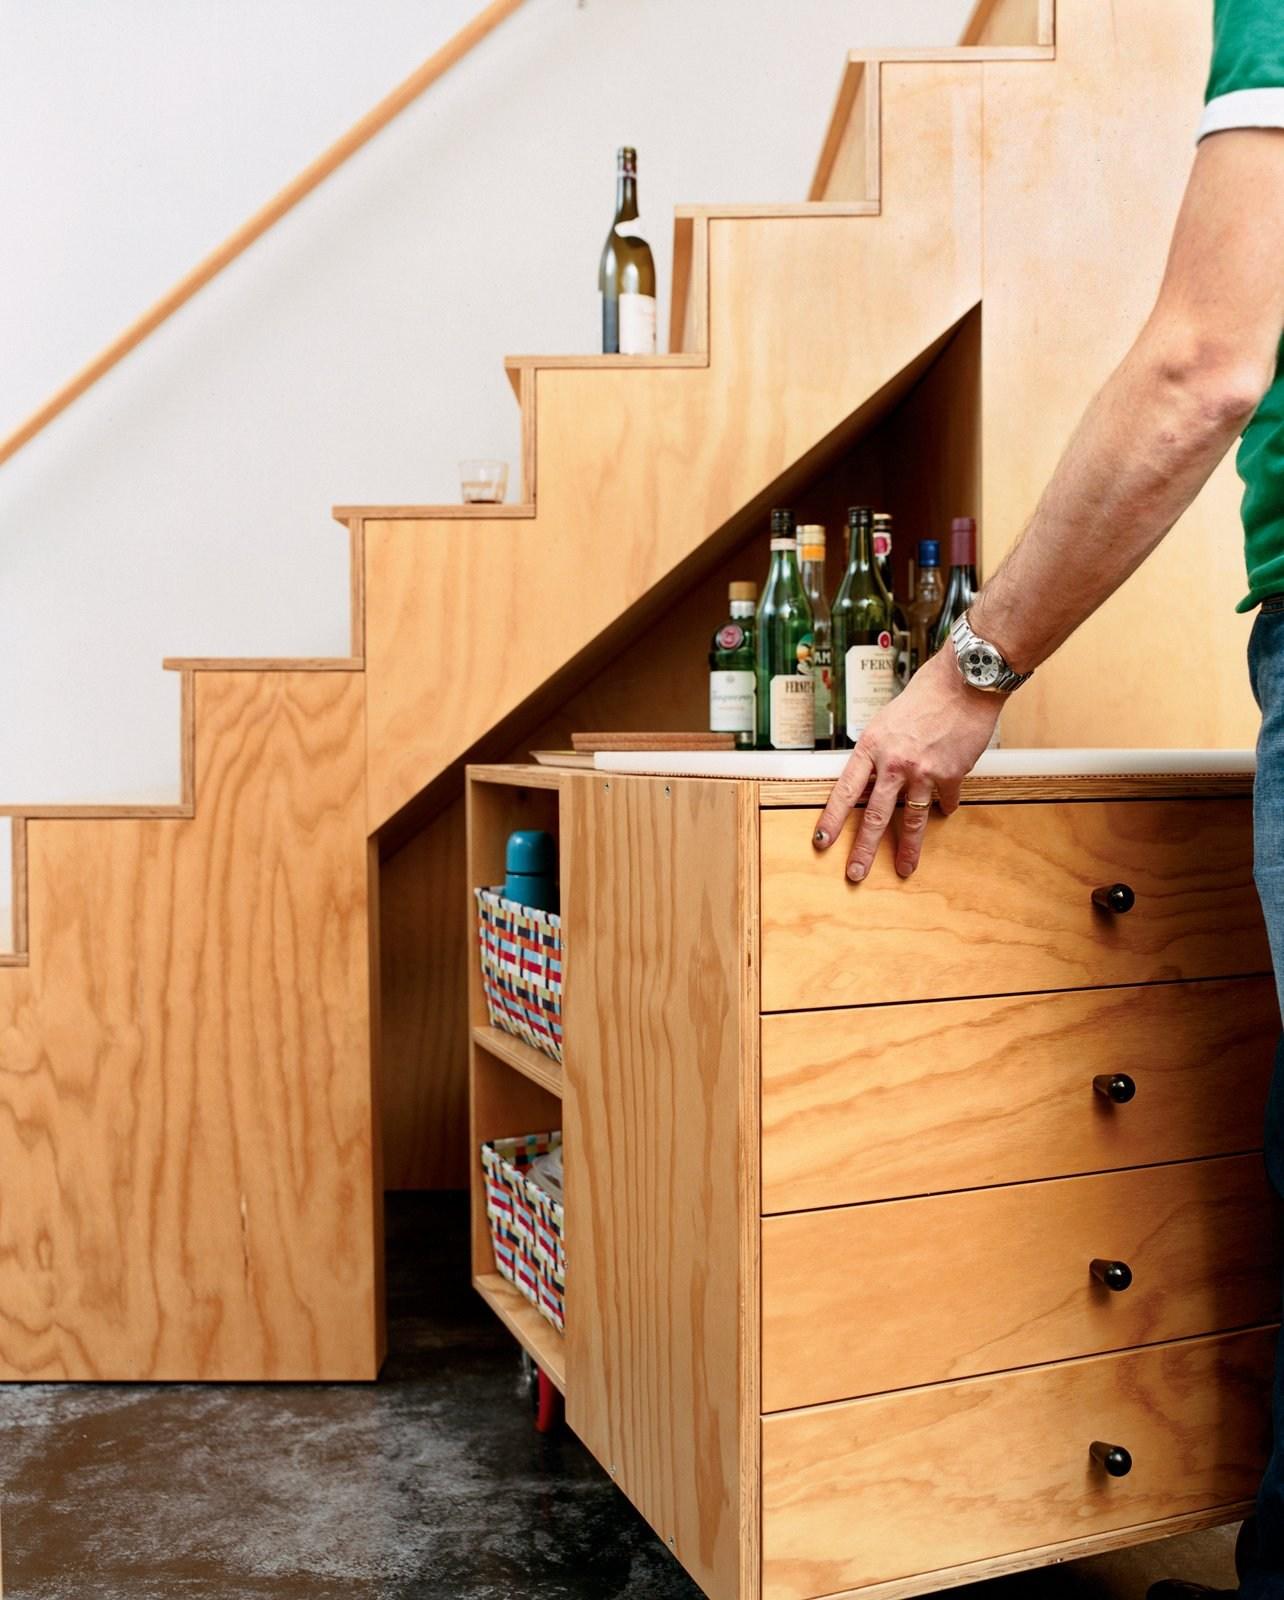 Photo 2 Of 10 In 10 Smart And Surprising Under Stair Design   Bar Under The Stairs Design   Living Room   Stair Storage   Interior Design   Wine Cellar   Storage